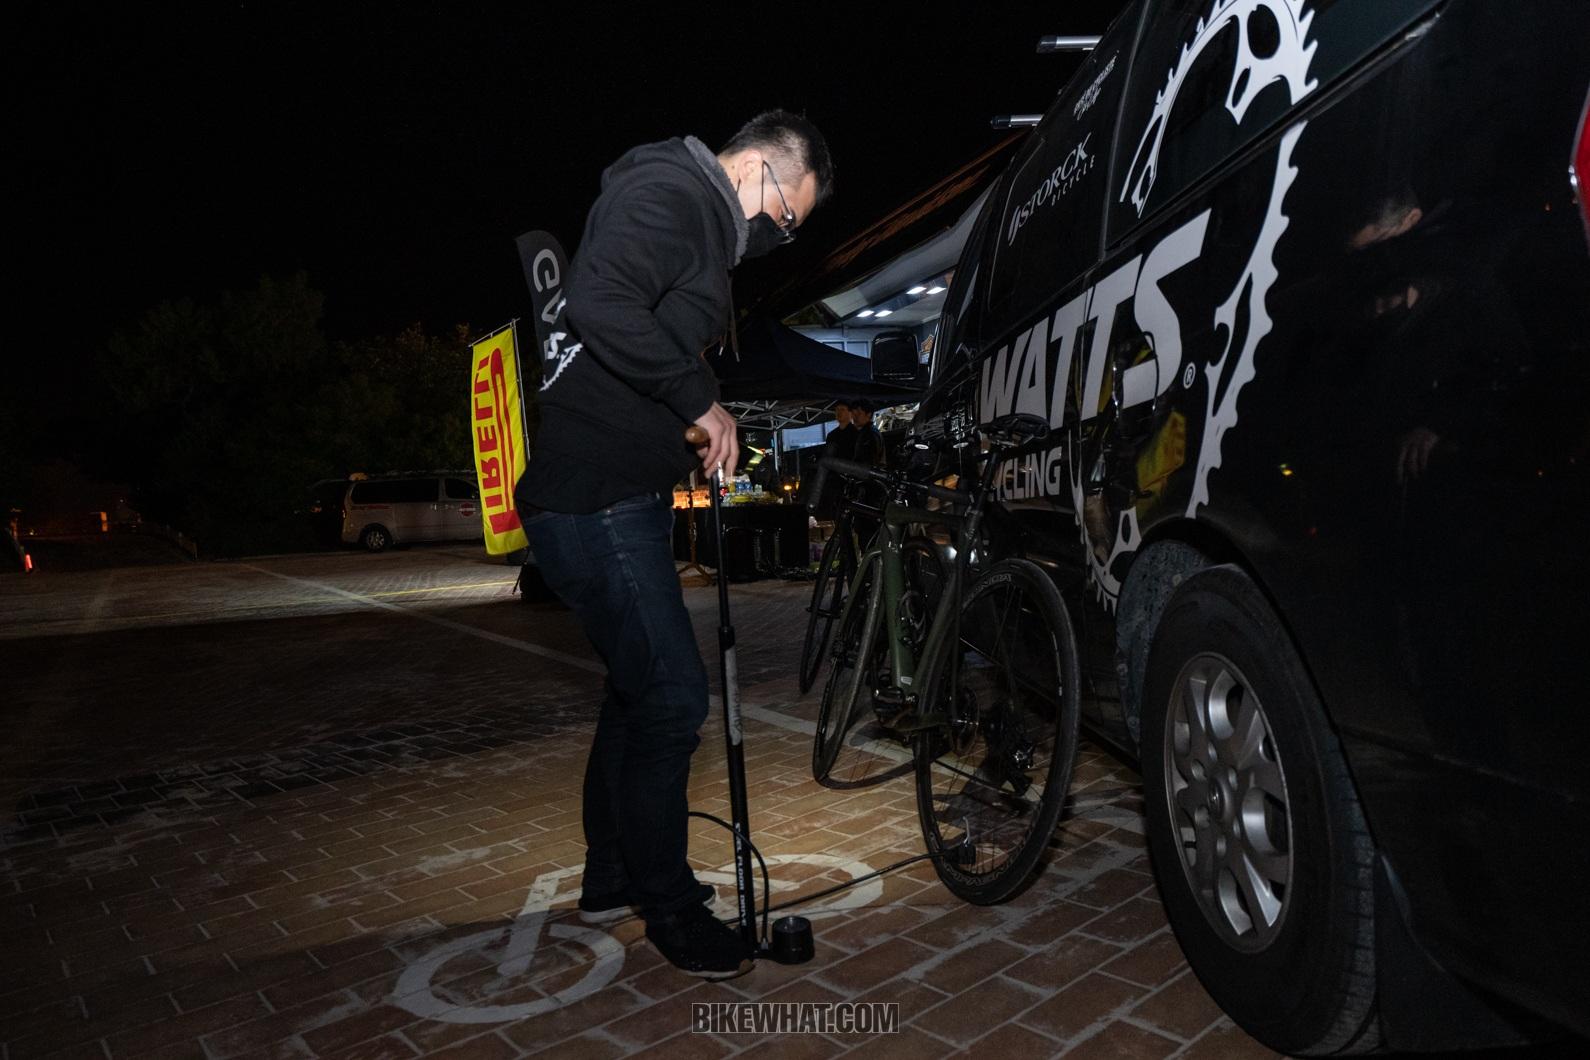 Charity_ride_2018 (3).jpg